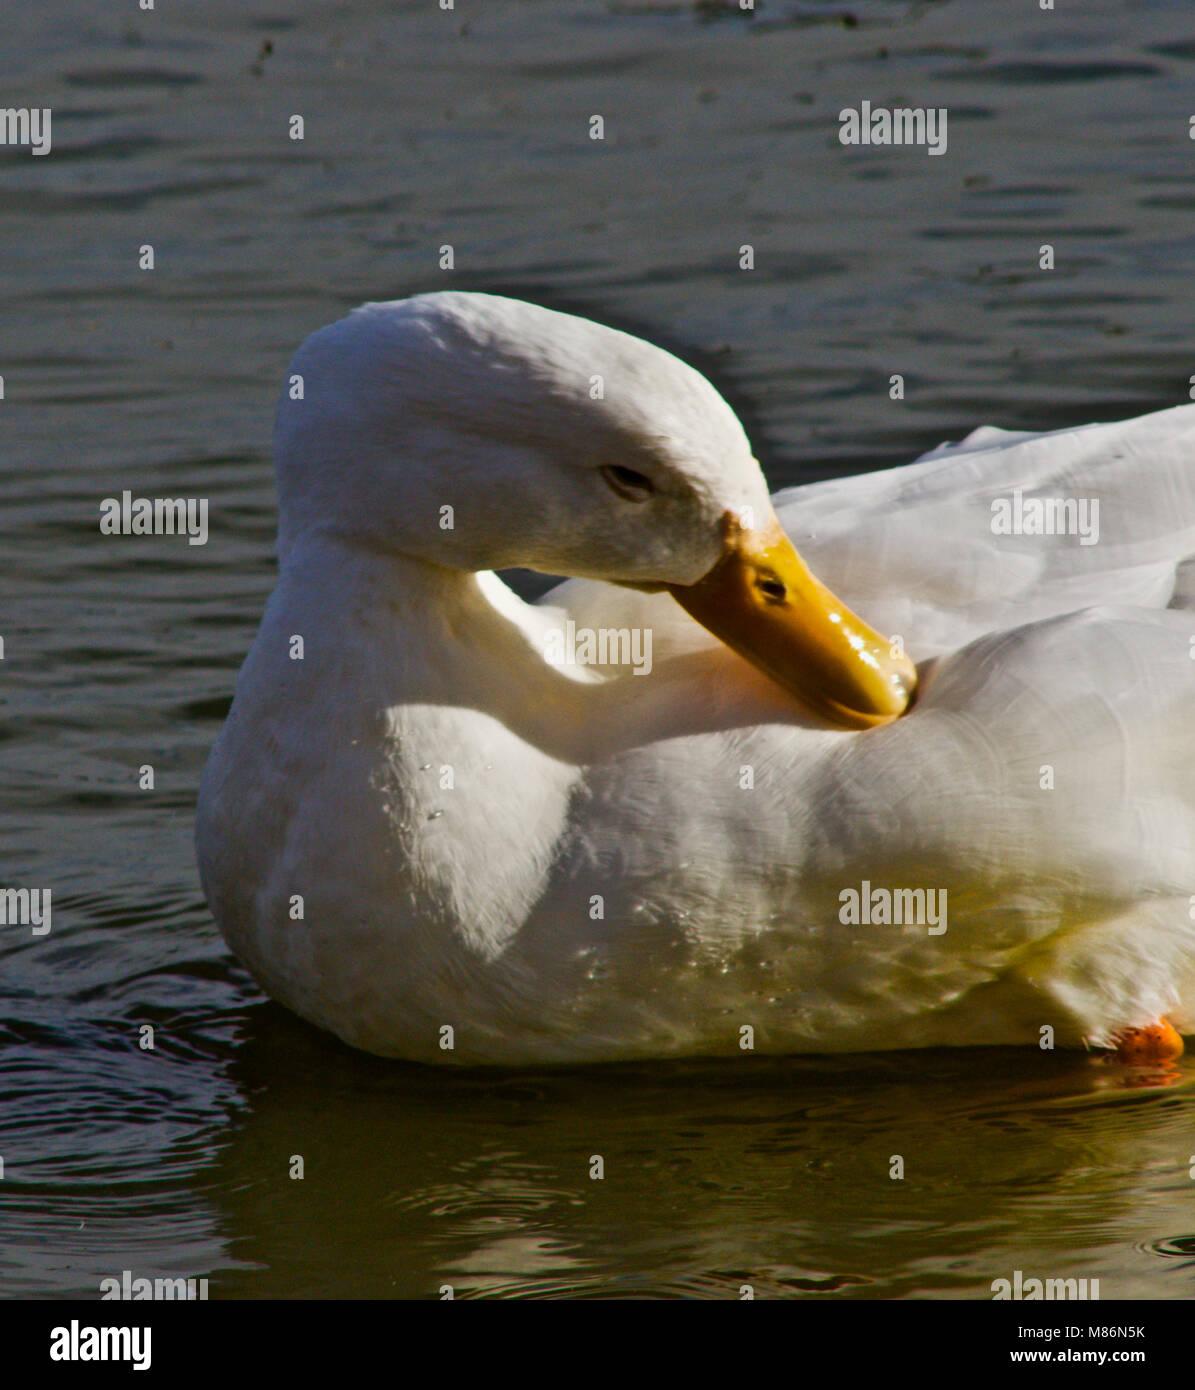 Tame Park Duck Preening - Stock Image